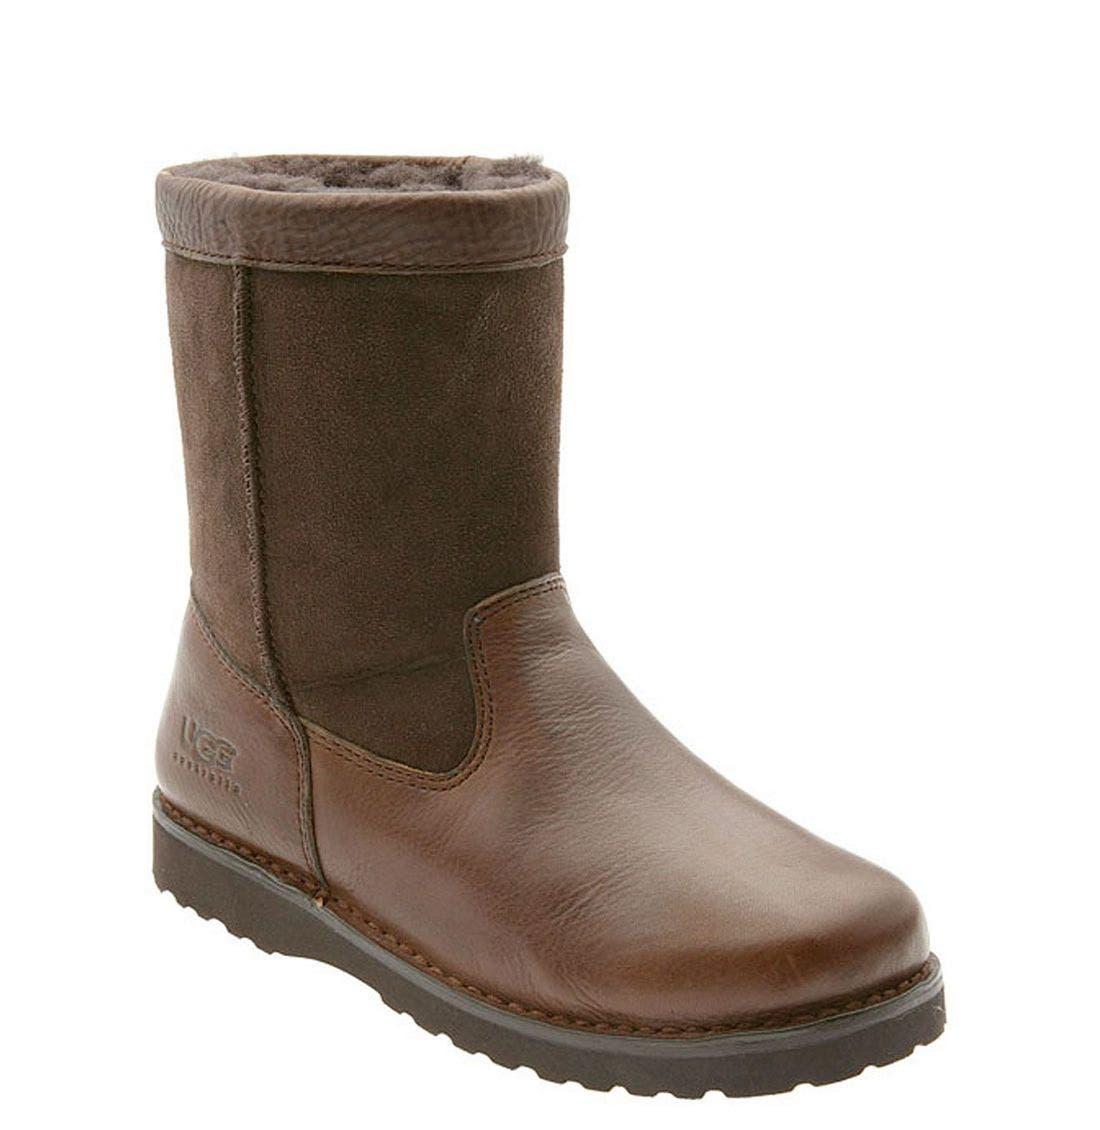 Alternate Image 1 Selected - UGG® Australia 'Birch' Boot (Toddler, Little Kid & Big Kid)